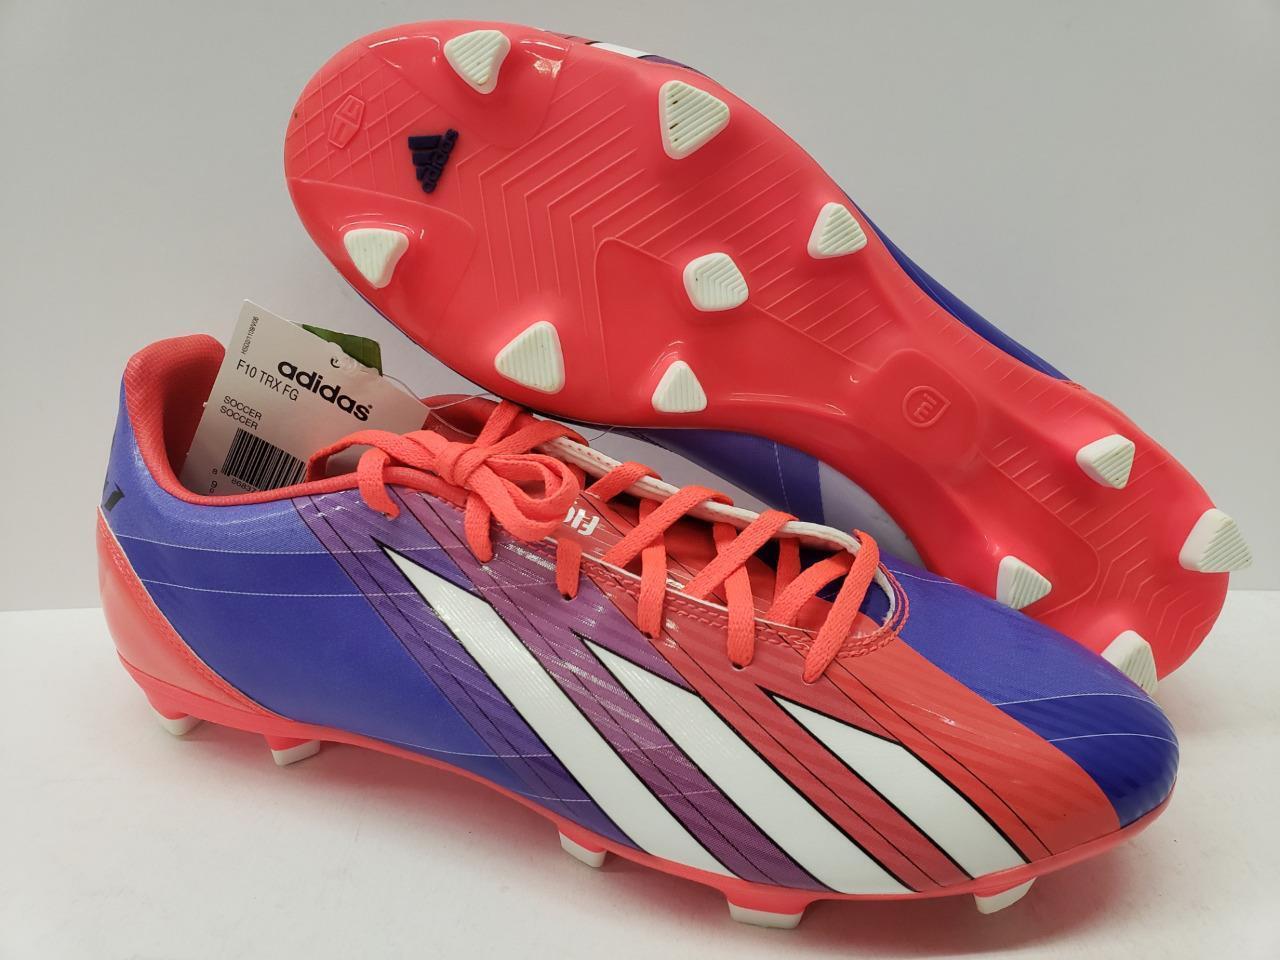 a891adb80 Adidas G97729 F10 TRX Firm Messi Soccer shoes Cleats Purple Pink Mens FG  Ground nvicqd2988-Men